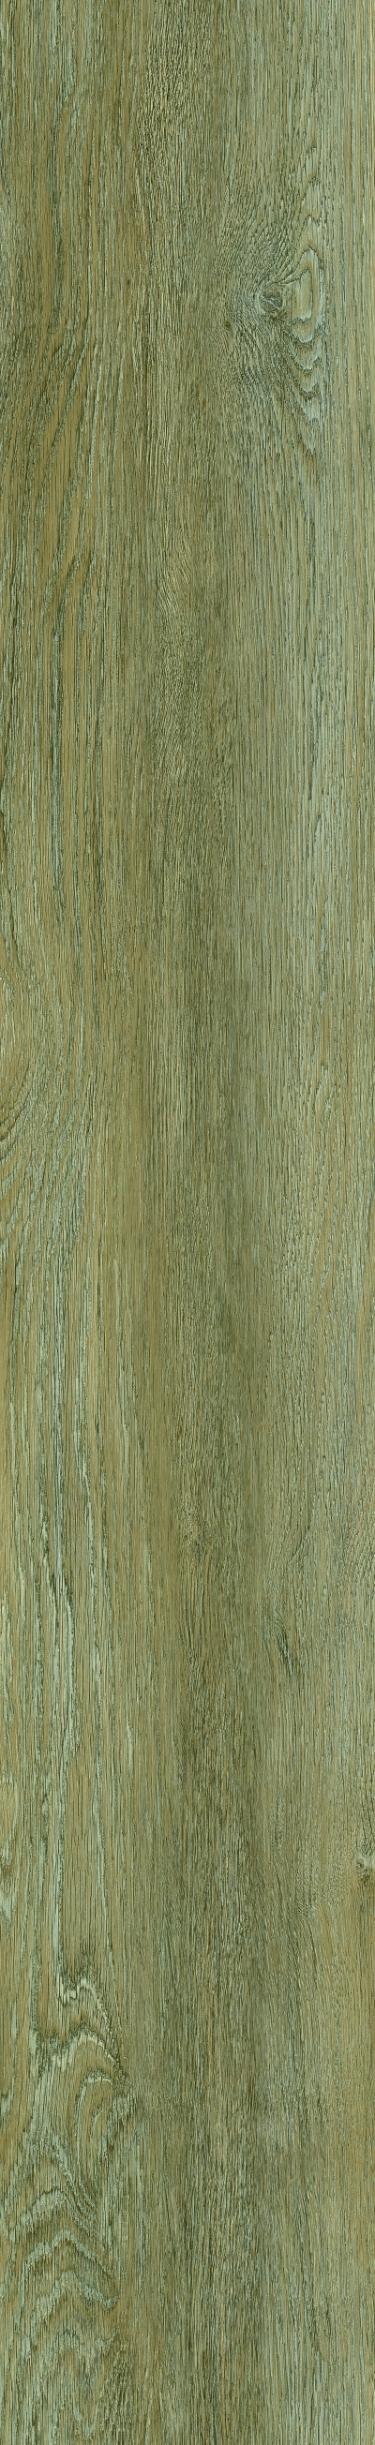 Vinylové podlahy Gerflor DESIGNART Home Empire Blond